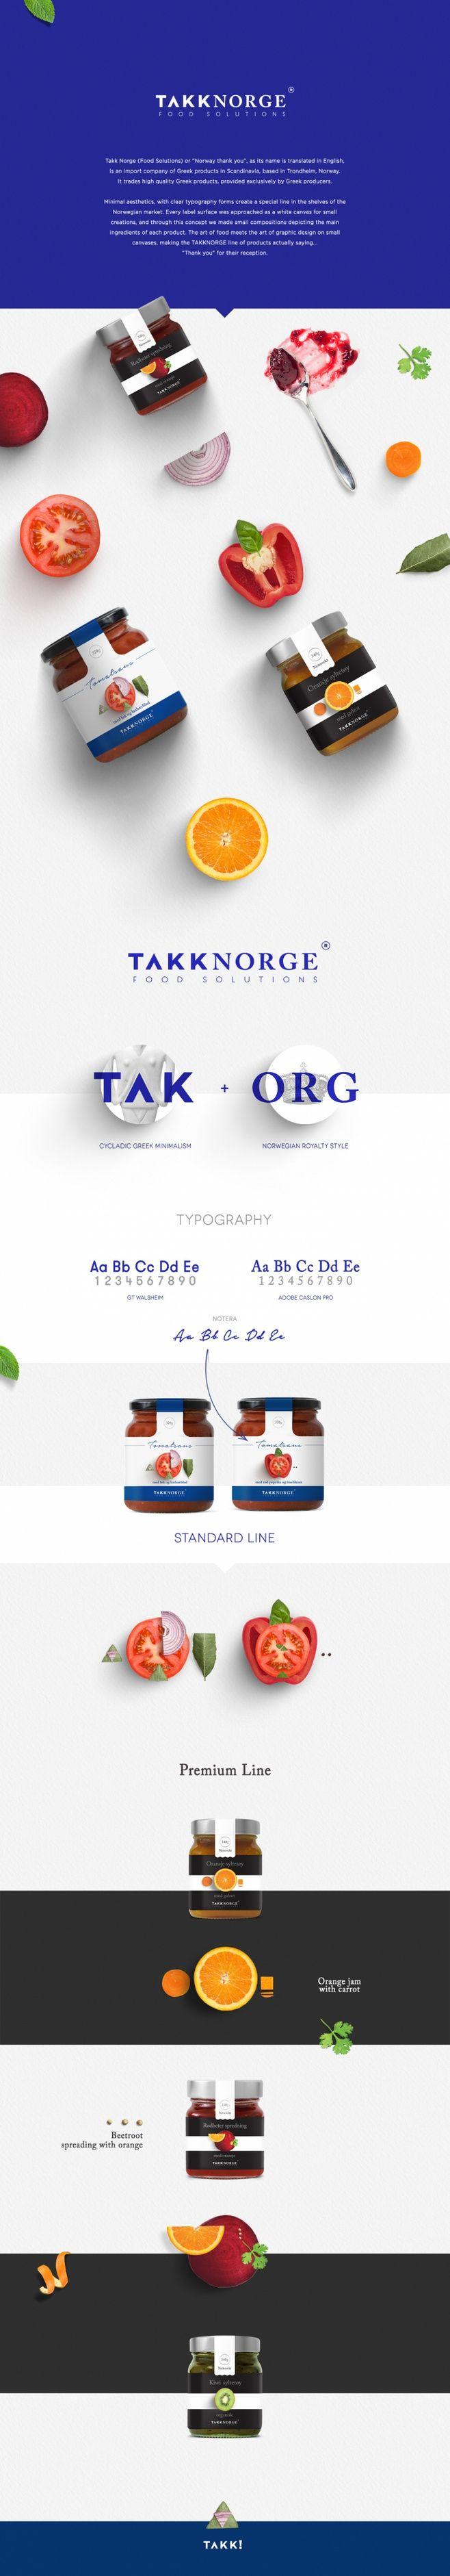 TAKK NORGE挪威果酱公司品牌包装...